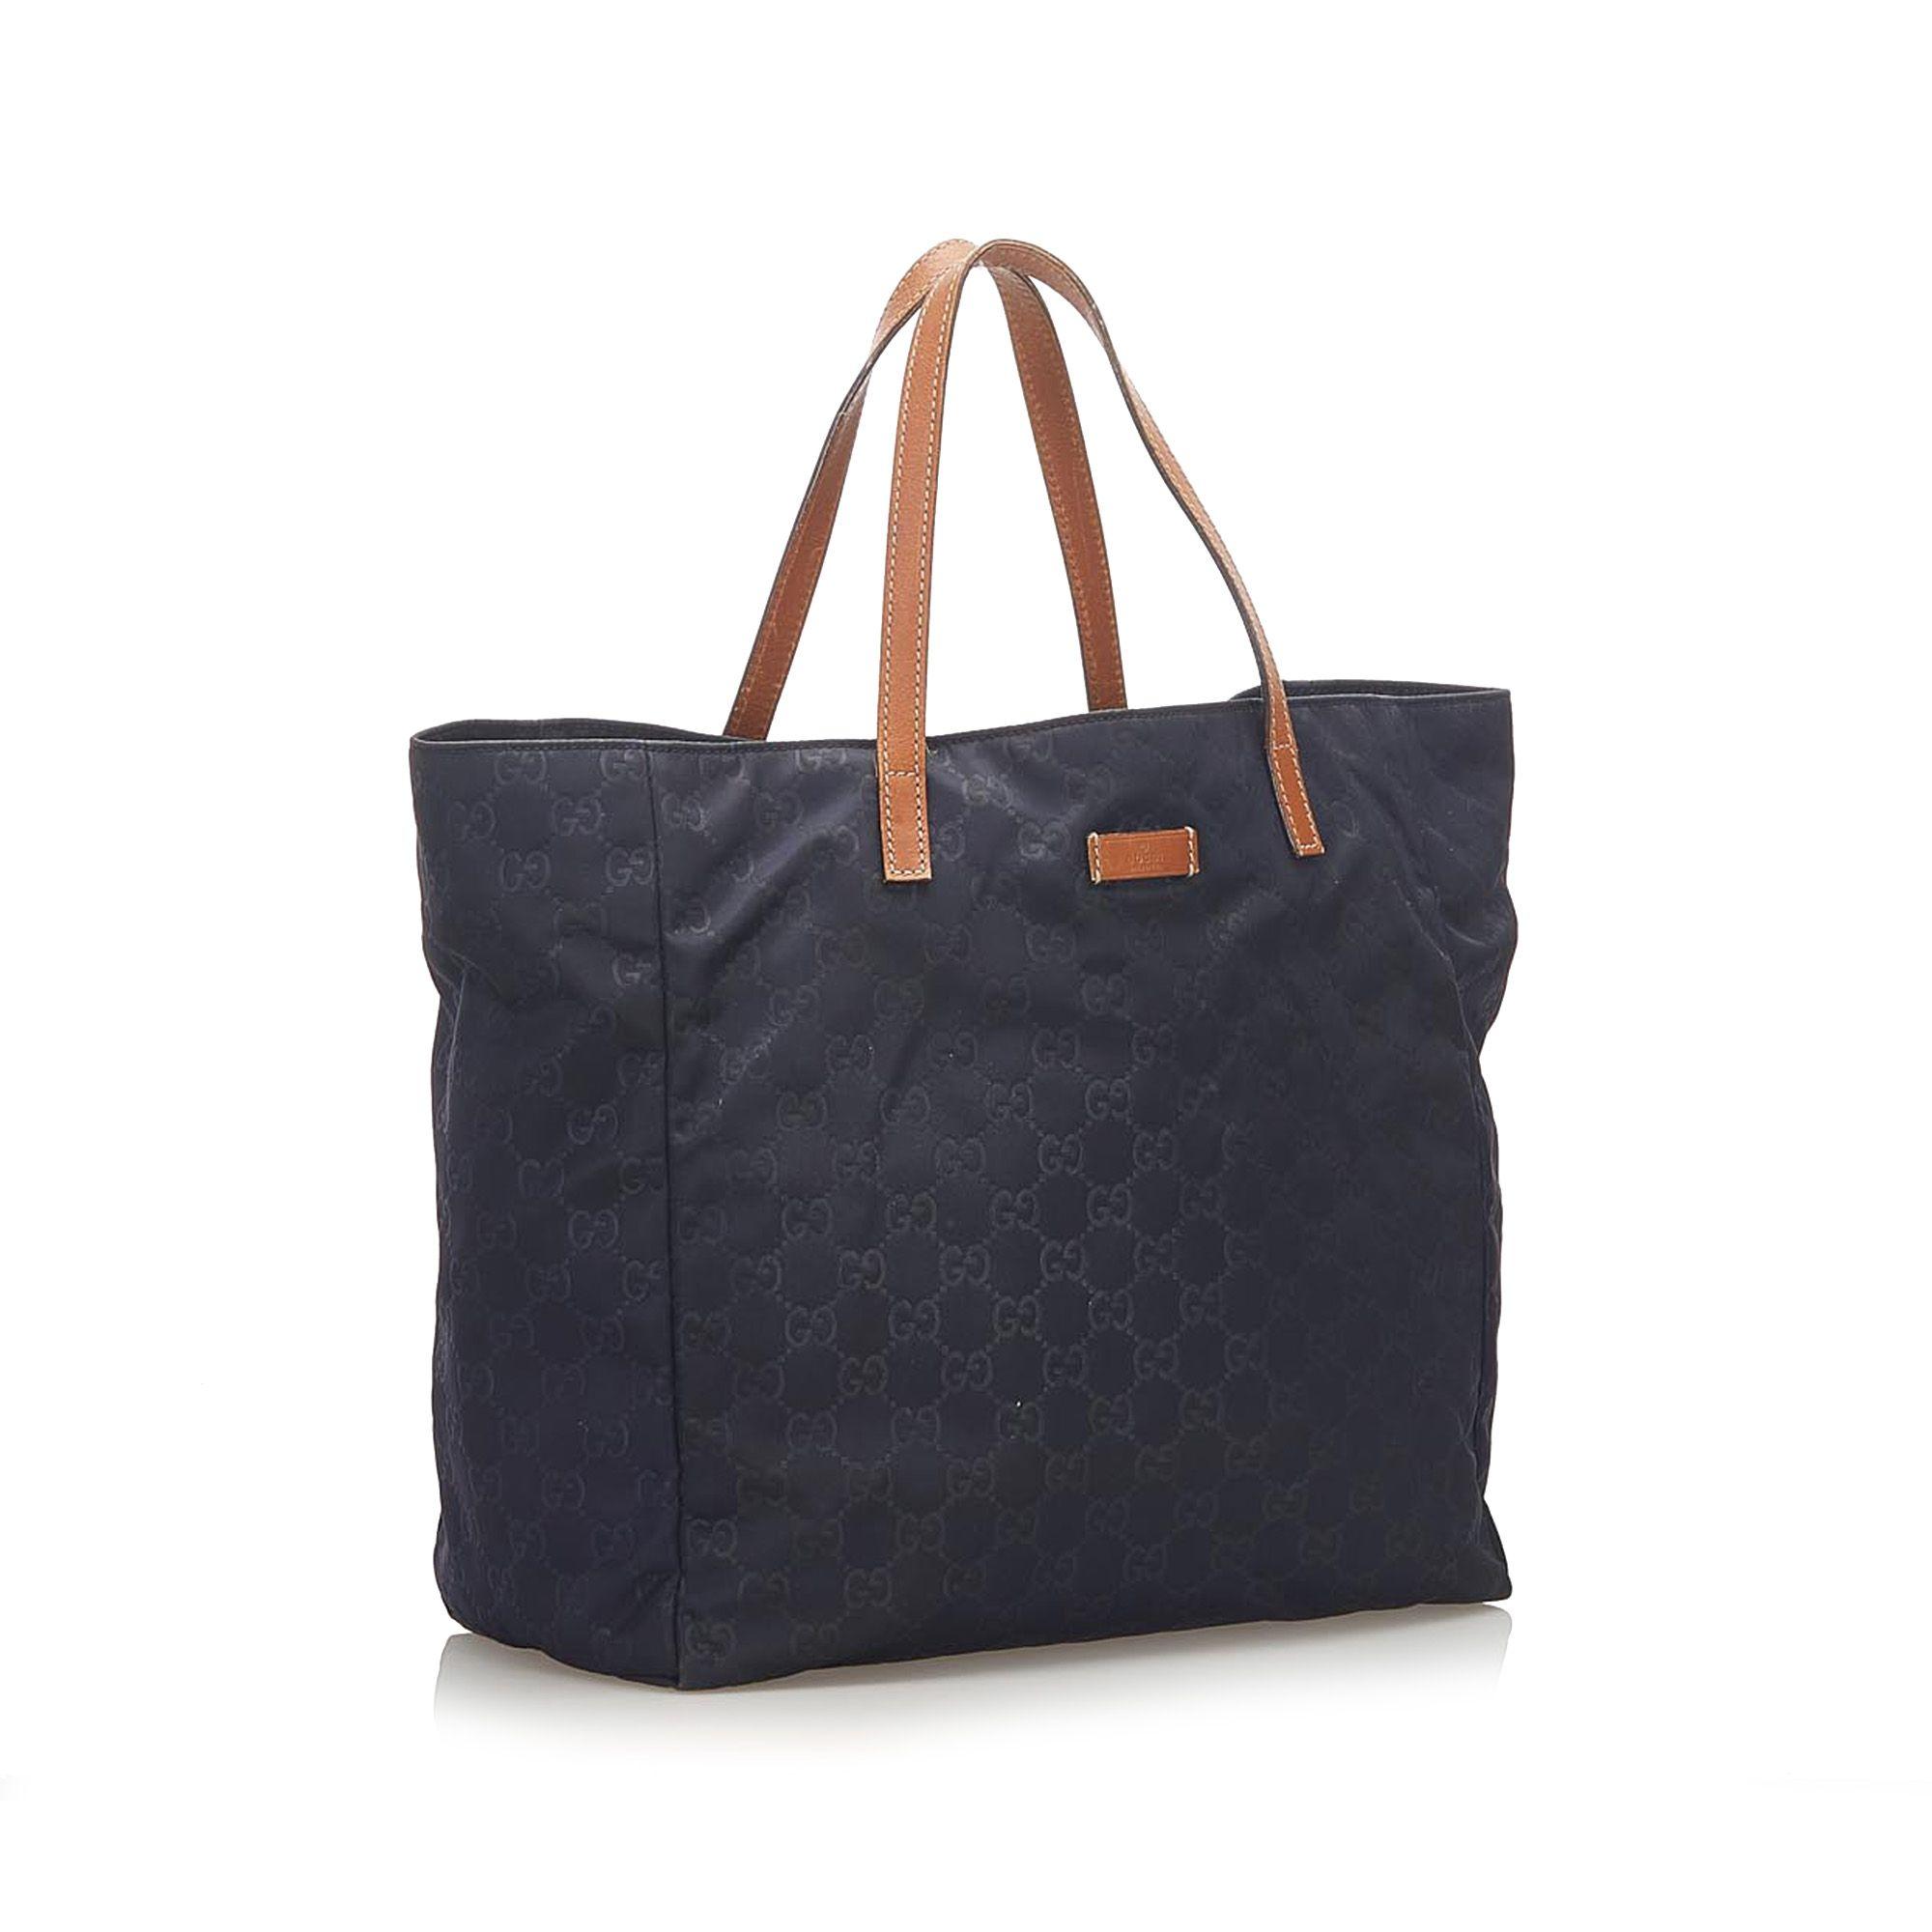 Vintage Gucci GG Nylon Tote Bag Blue